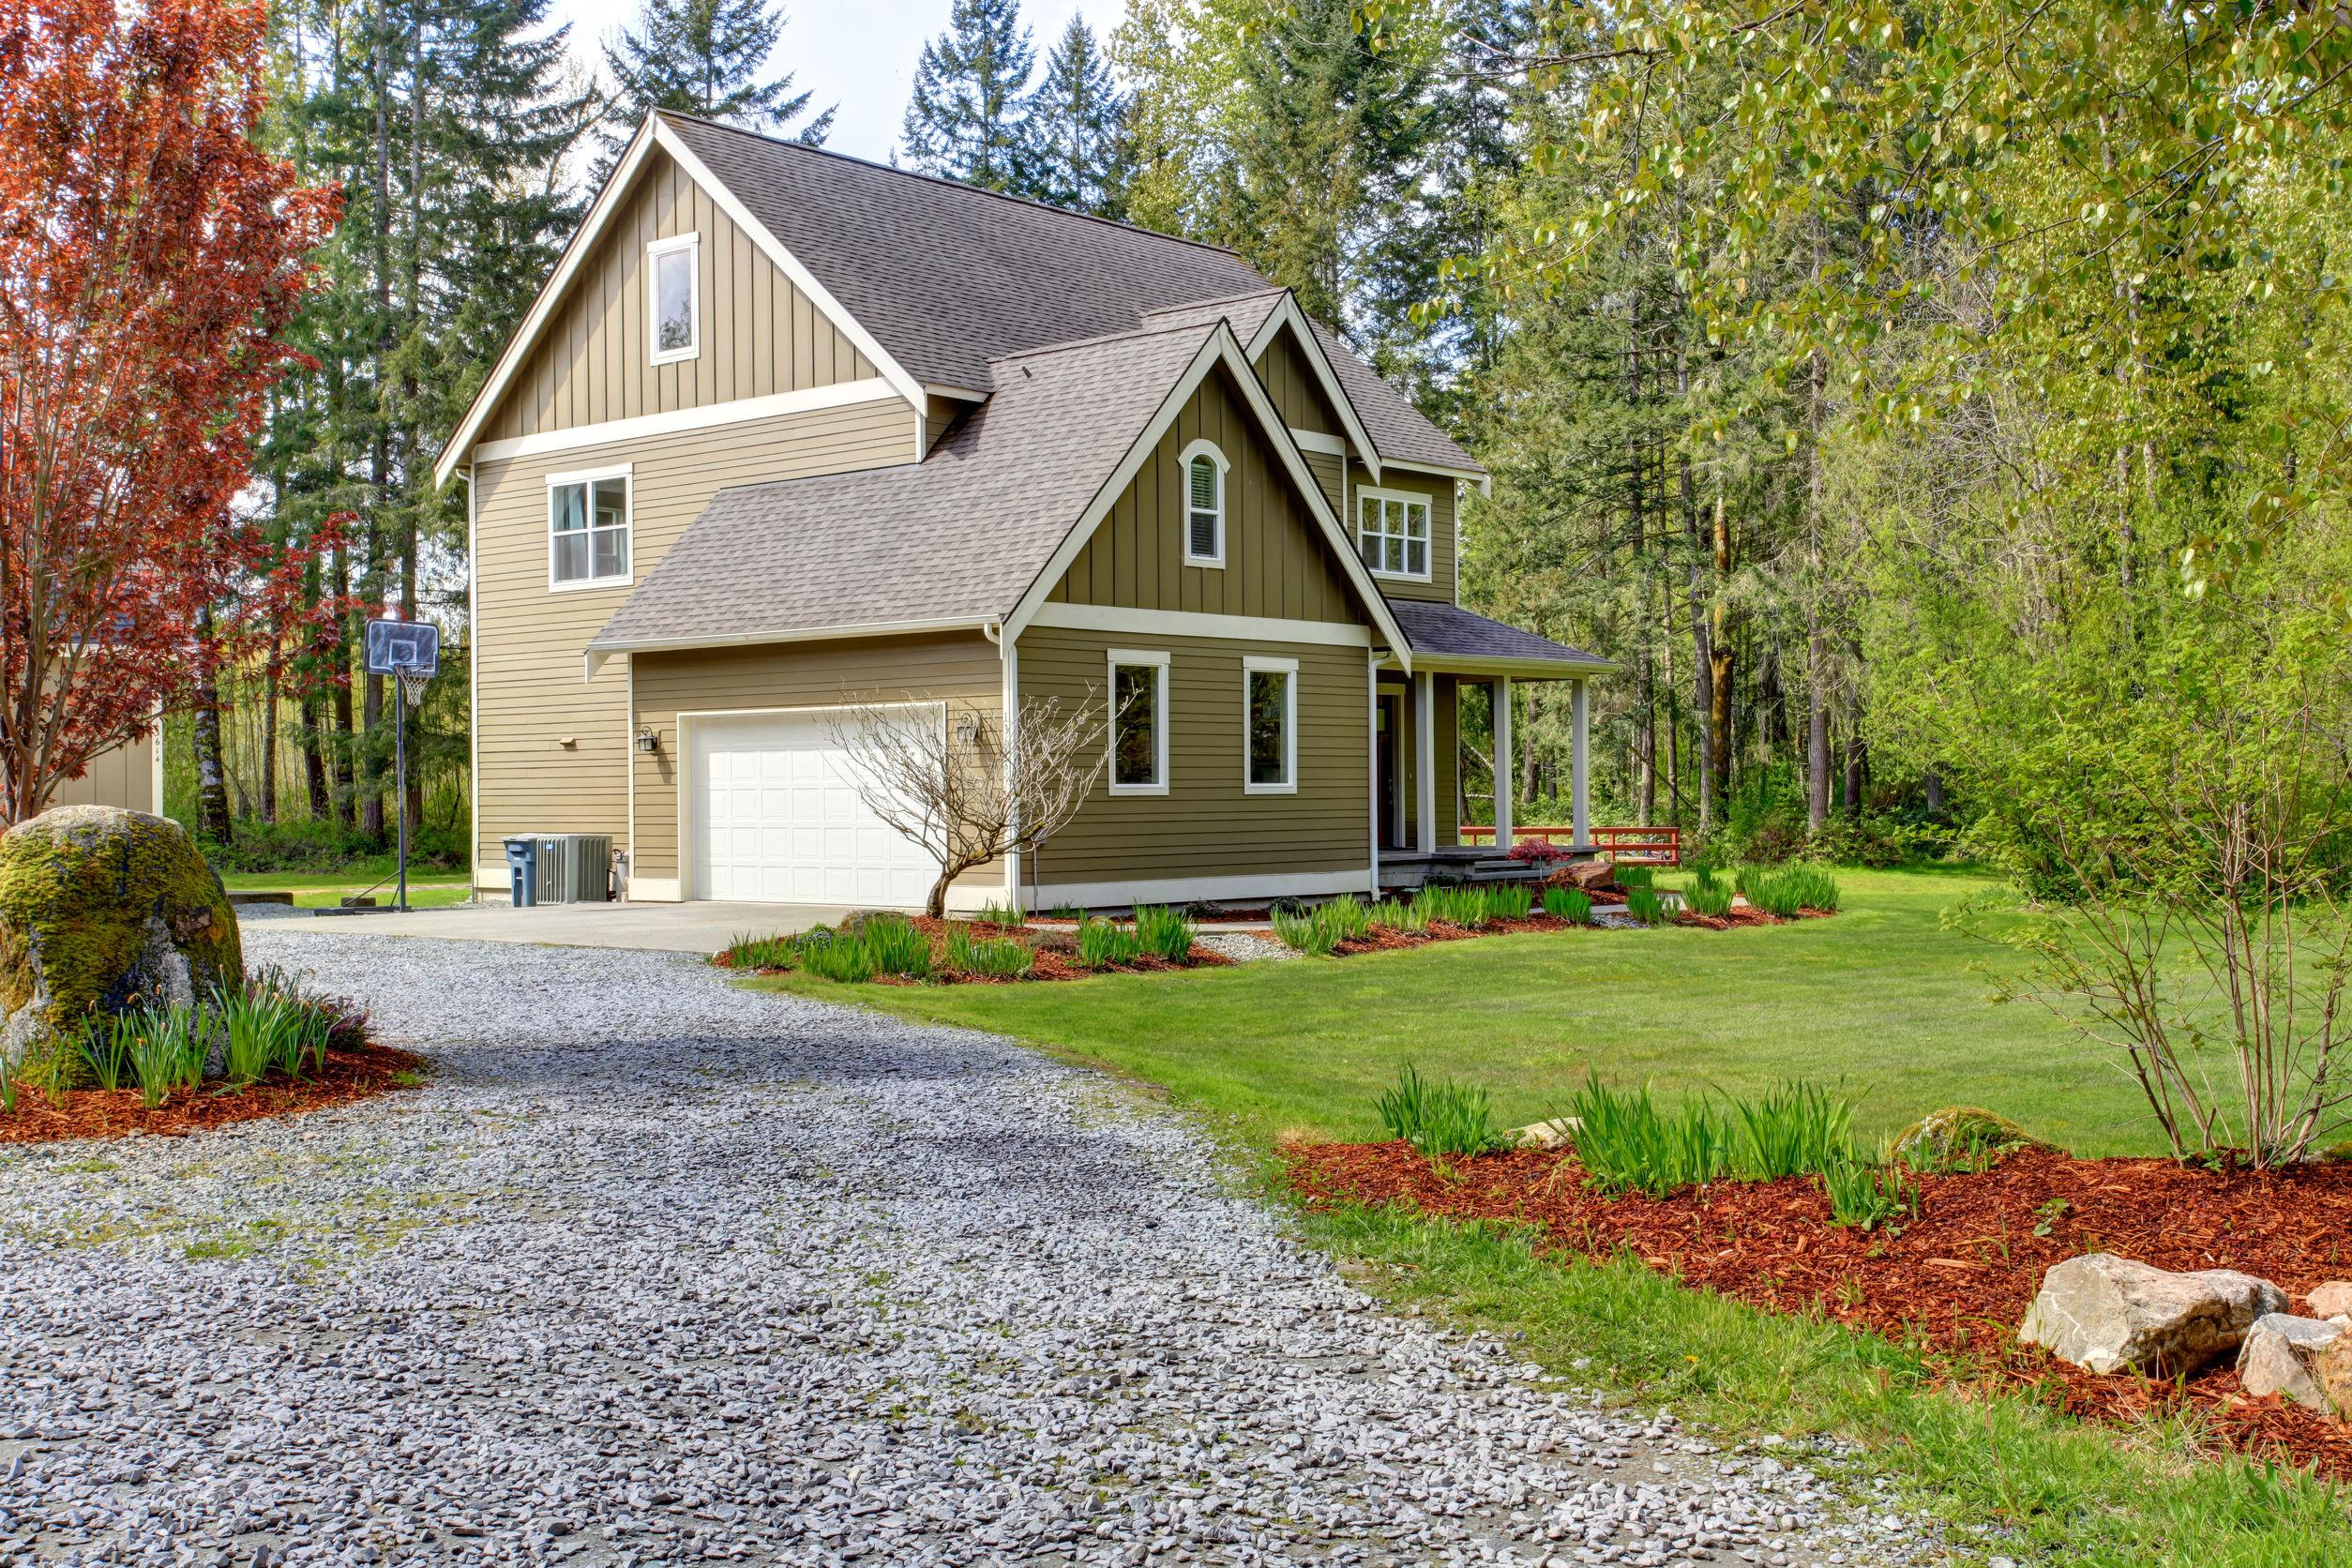 residential paving - gravel driveway